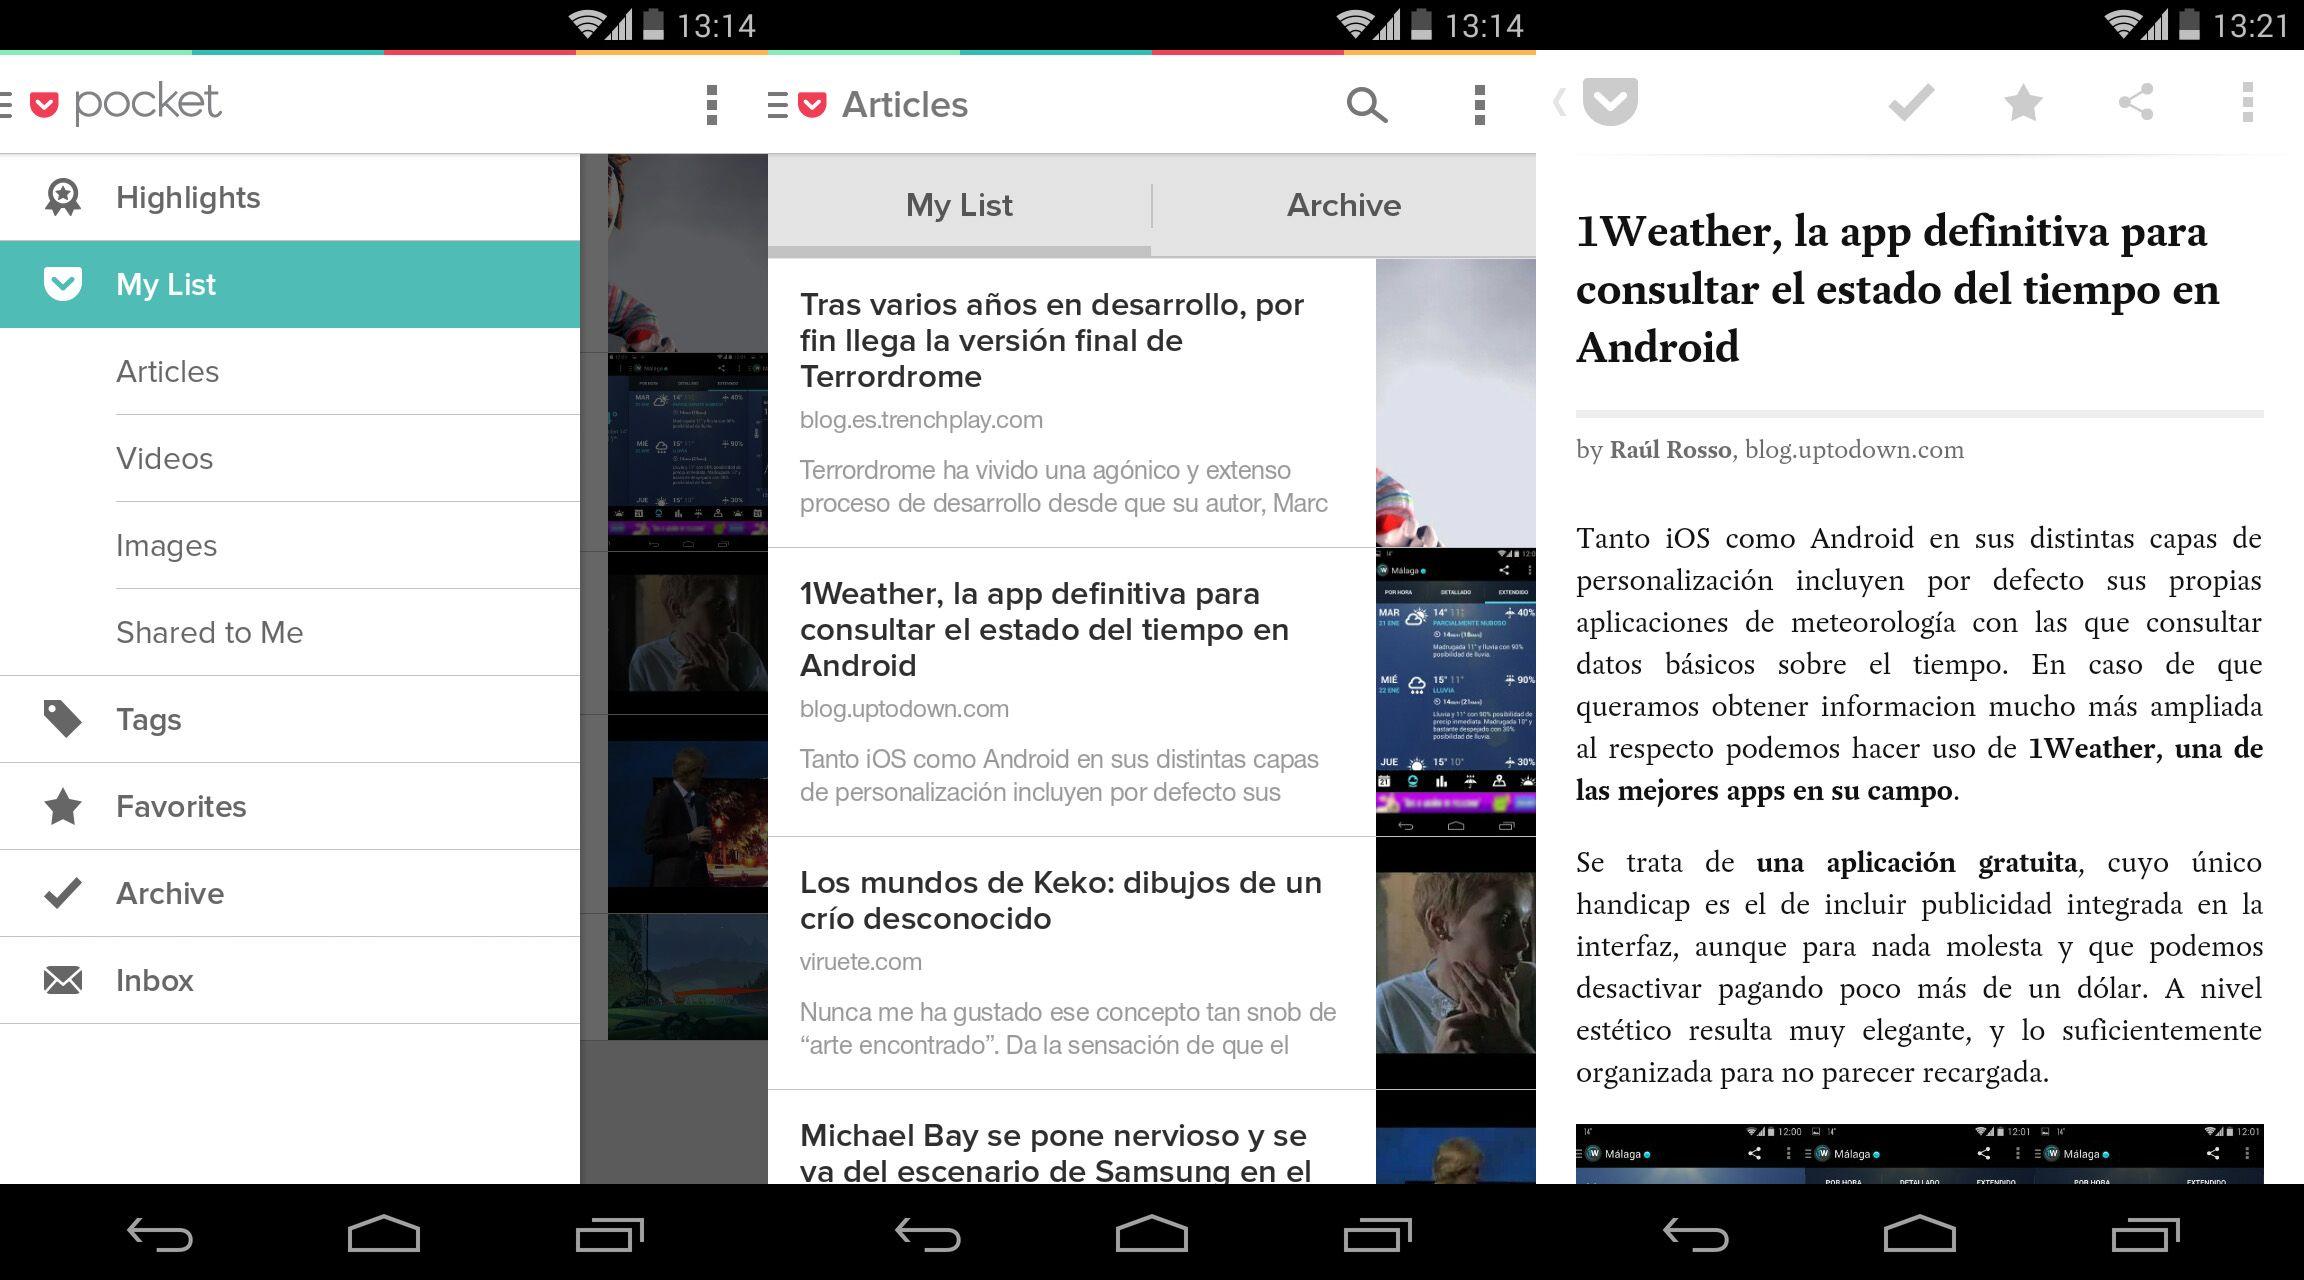 Pocket-screenshots-1